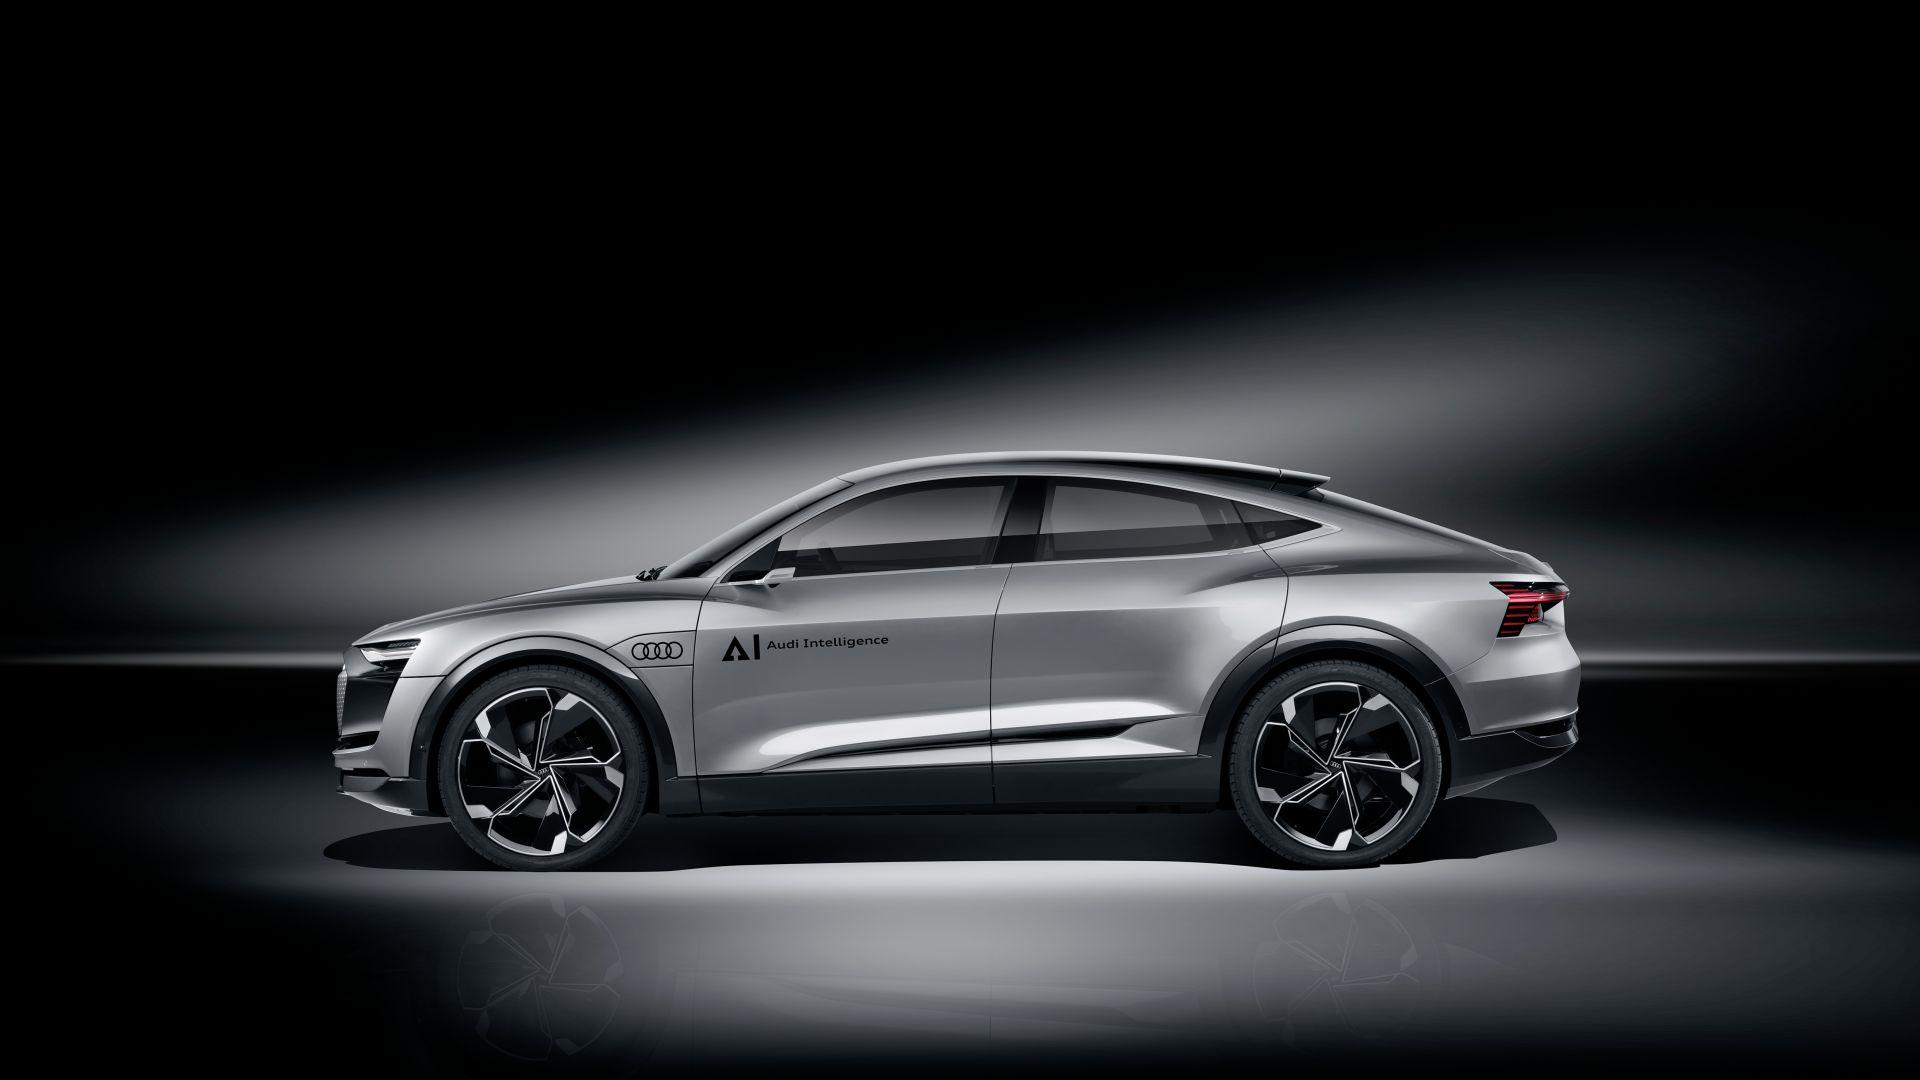 wallpaper audi elaine electric car 4k cars bikes 15753. Black Bedroom Furniture Sets. Home Design Ideas